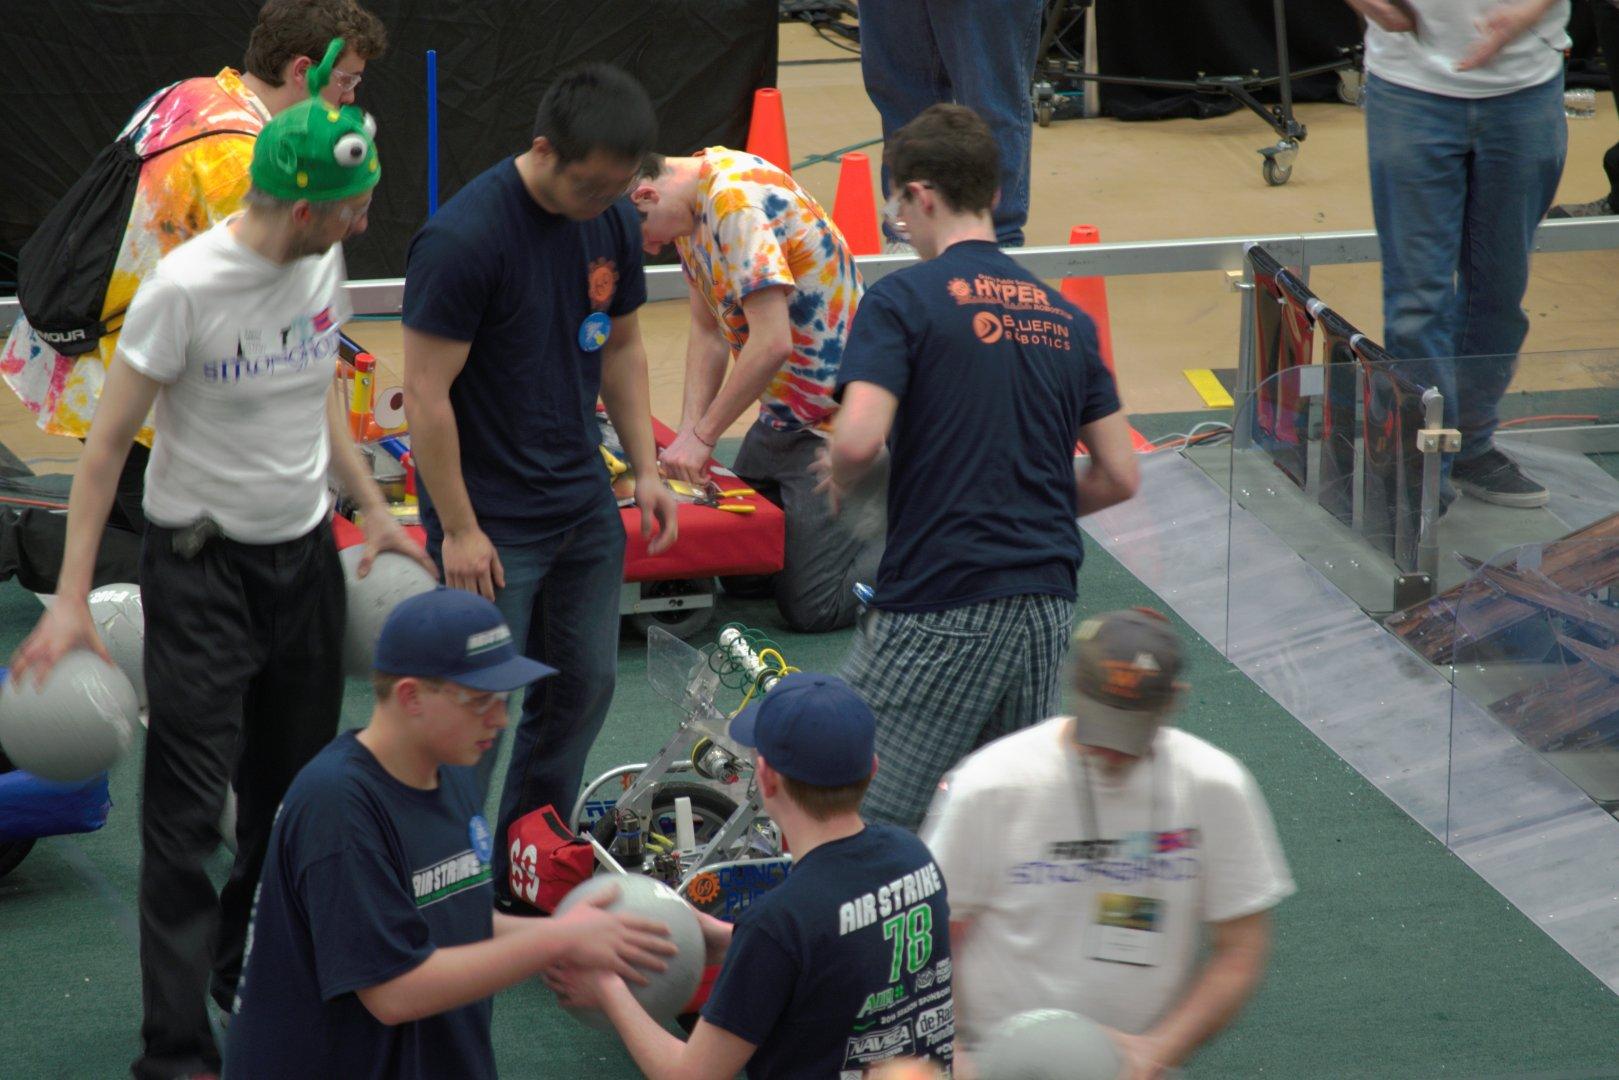 60-FIRST-Robotics-Competition-Umass-Dartmouth-March-18-20.2016-